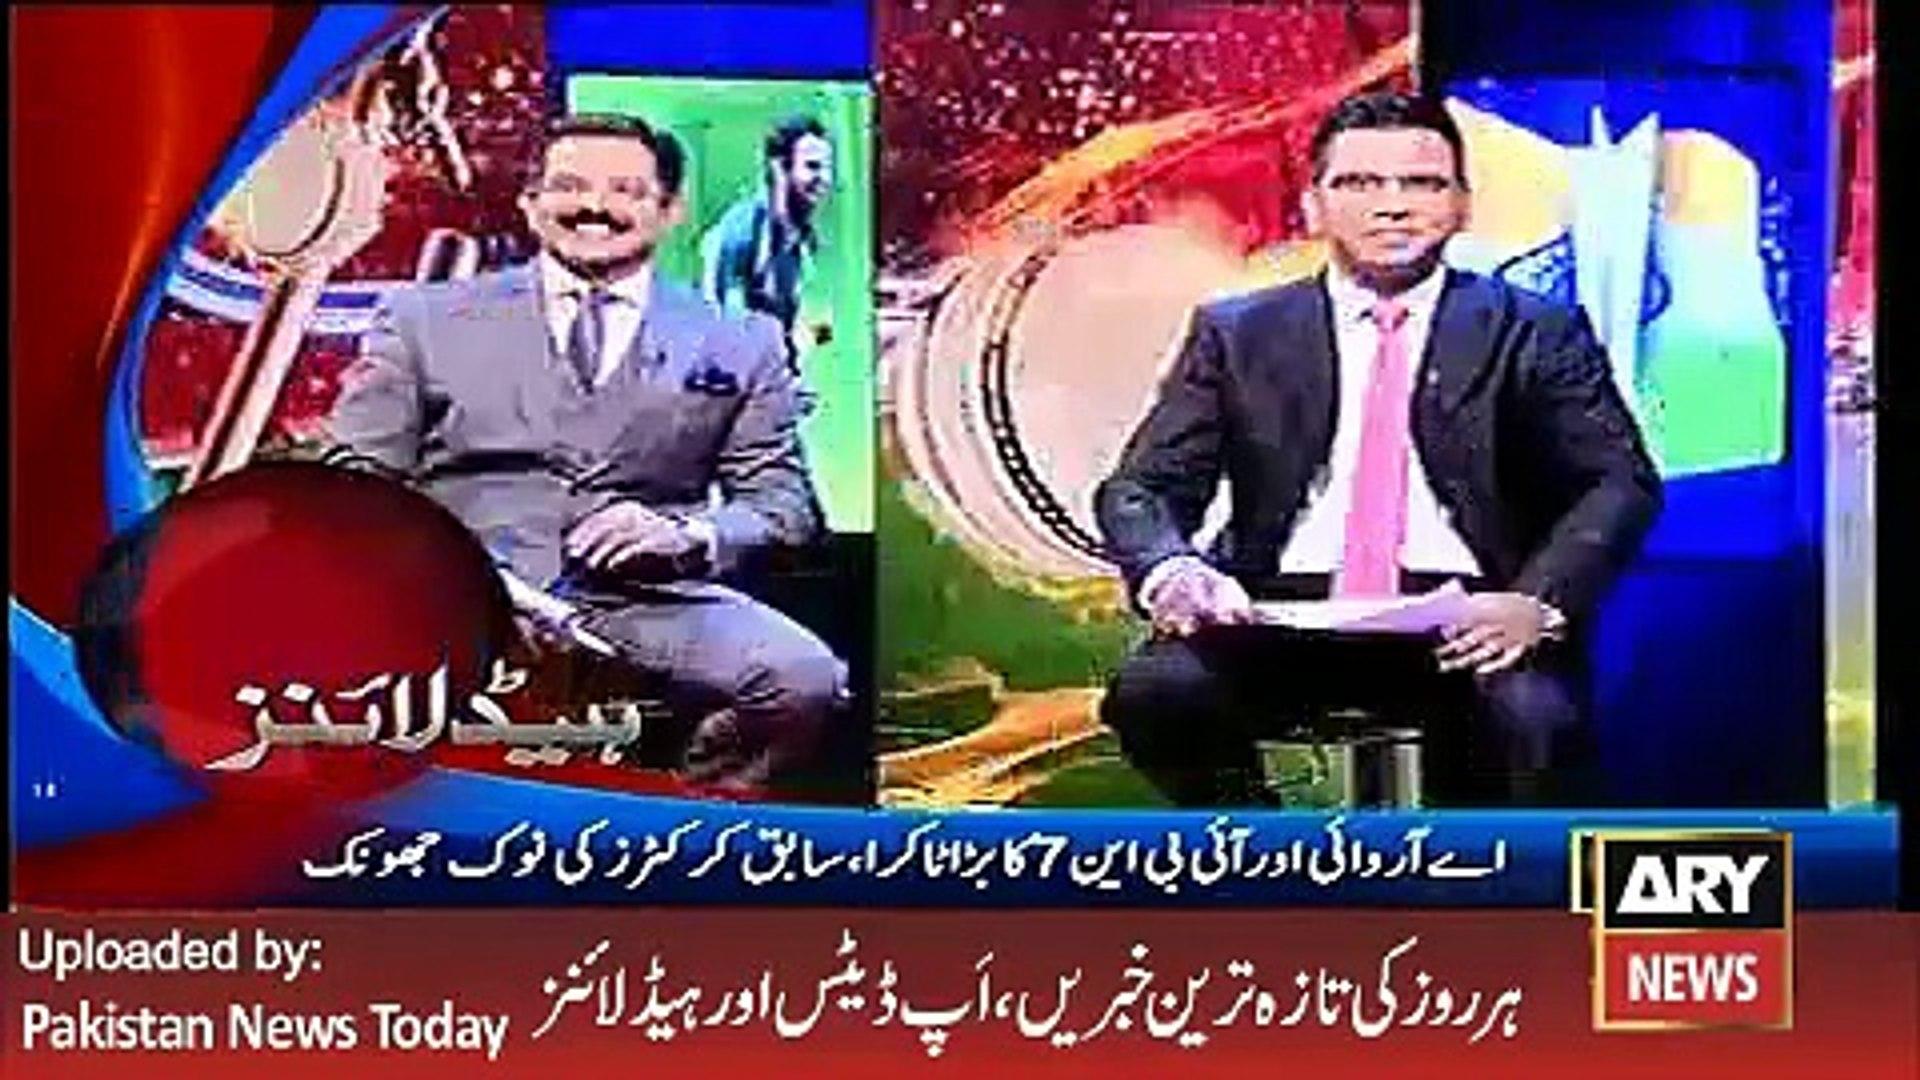 The News - ARY News Headlines 19 March 2016, Pakistan News -  Latest News